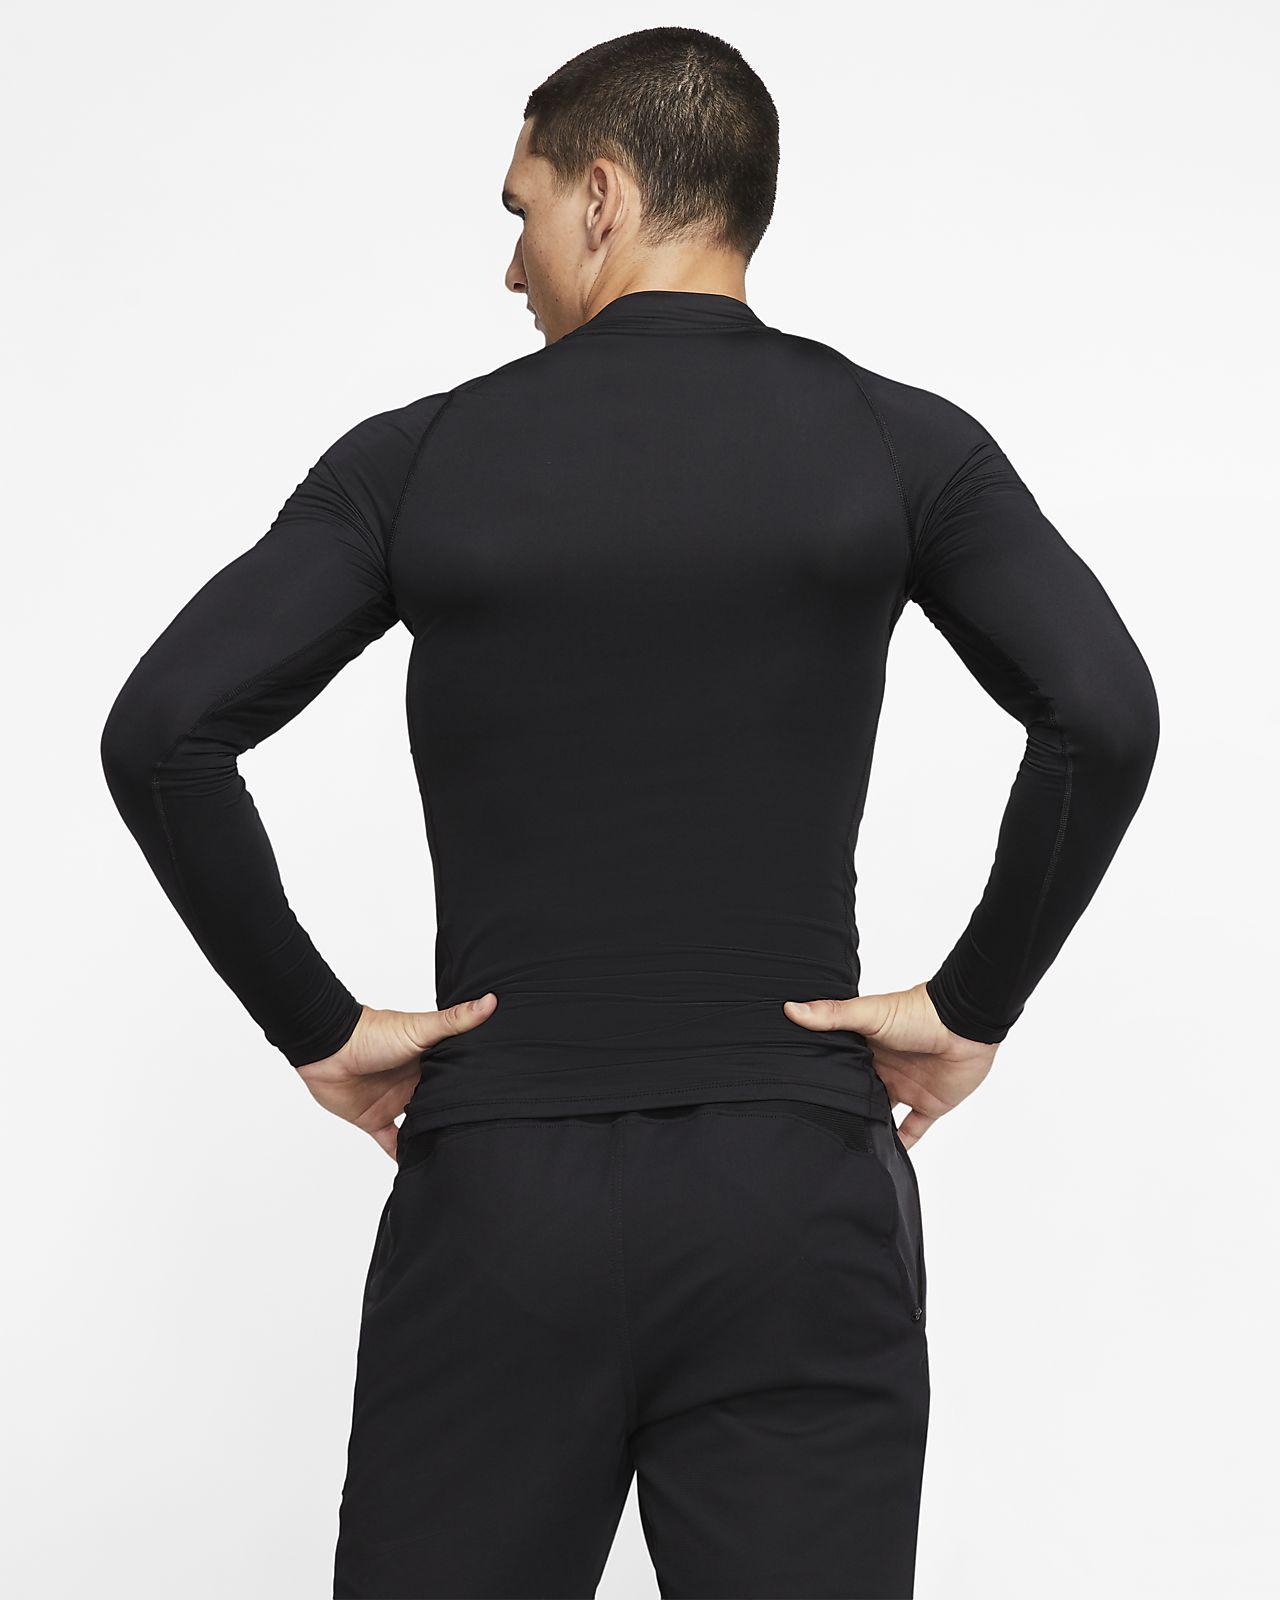 Nike Mens Pro Cool Long Sleeved Top | RLDM